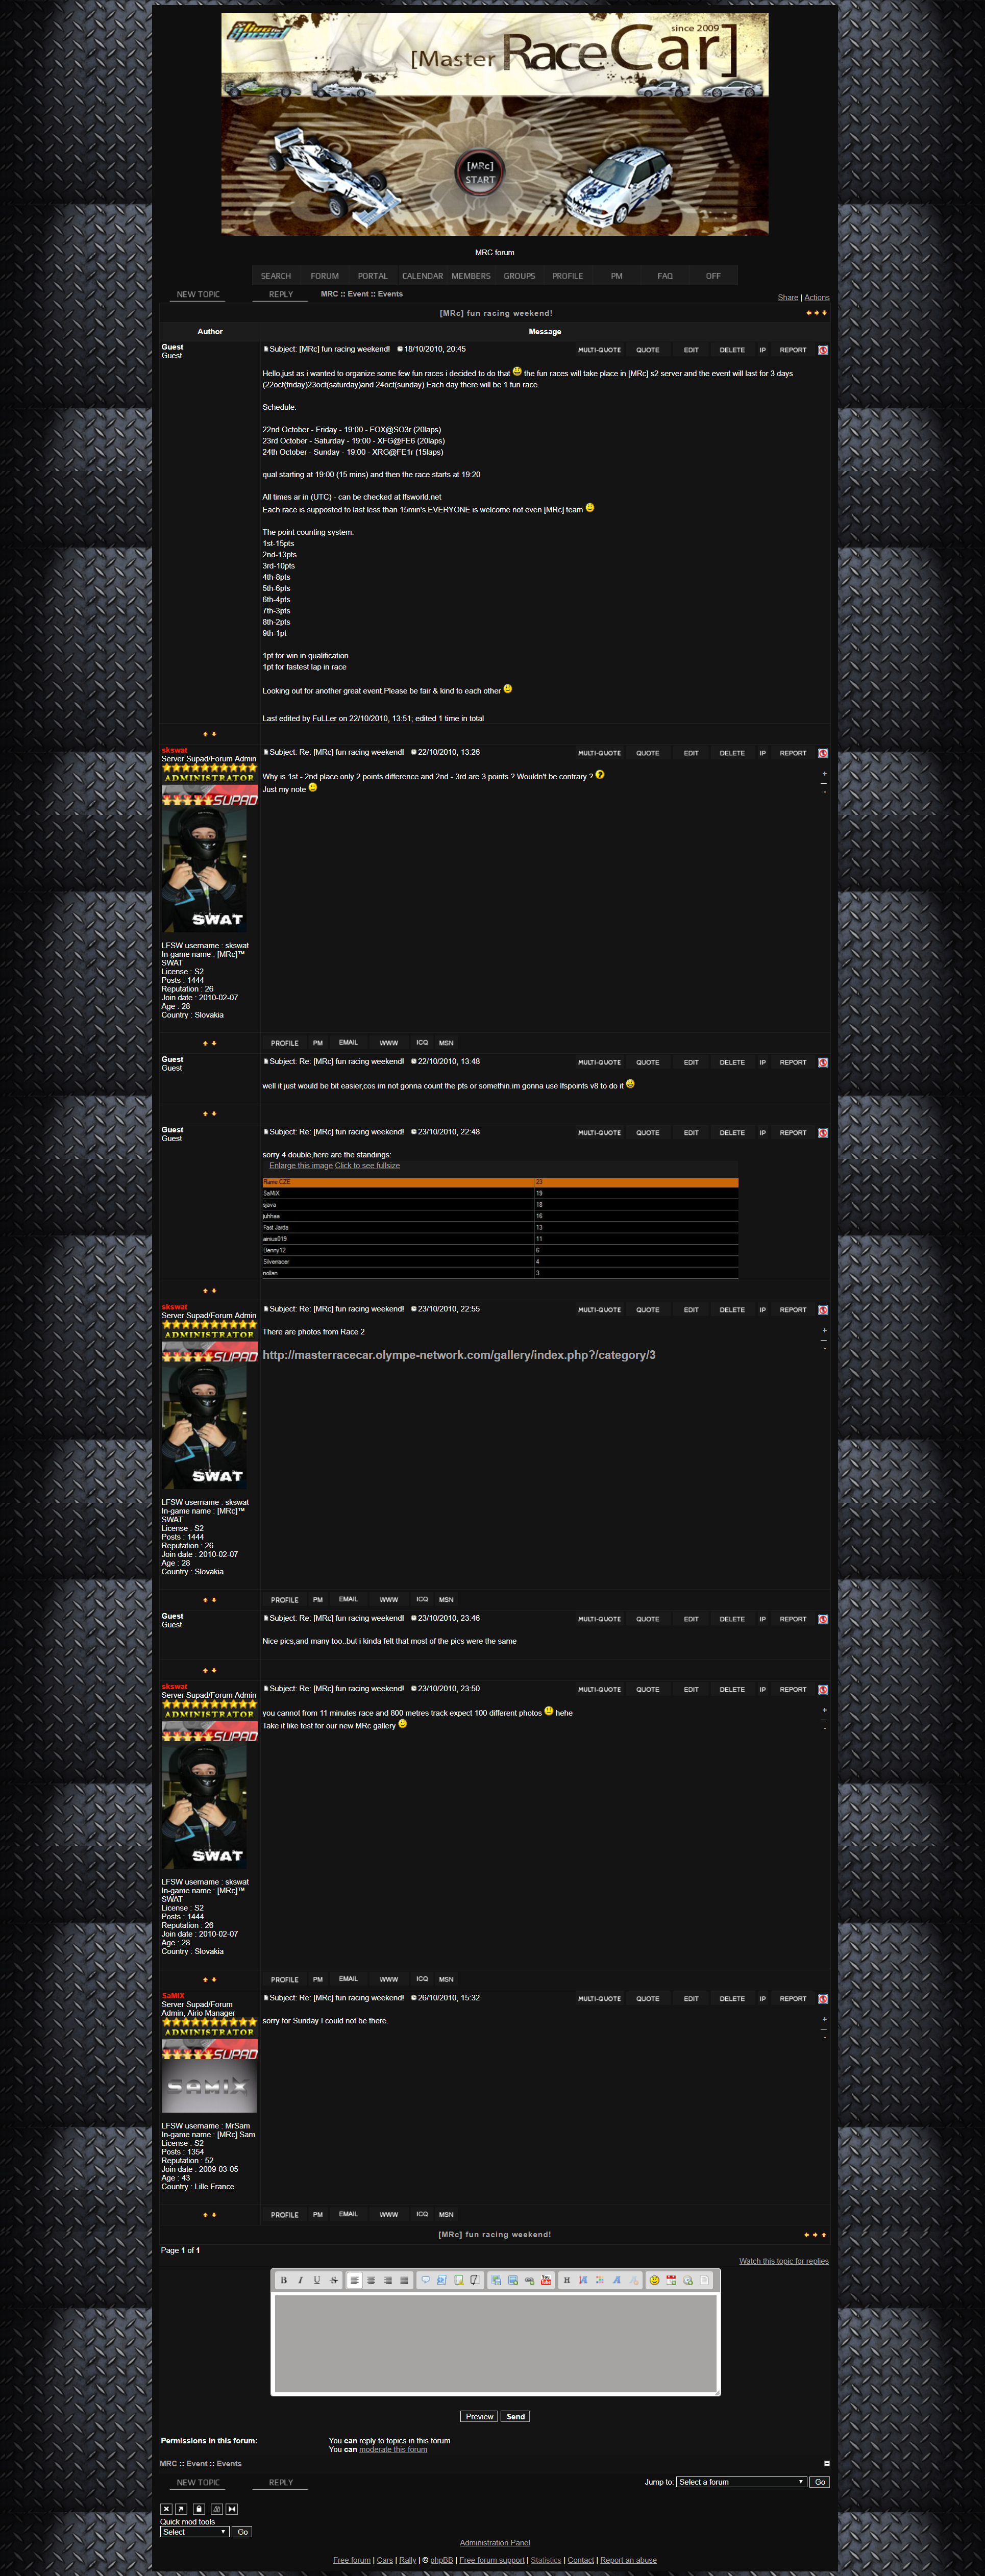 [Image: screencapture-masterracecar-forumactif-t...-51-19.jpg]